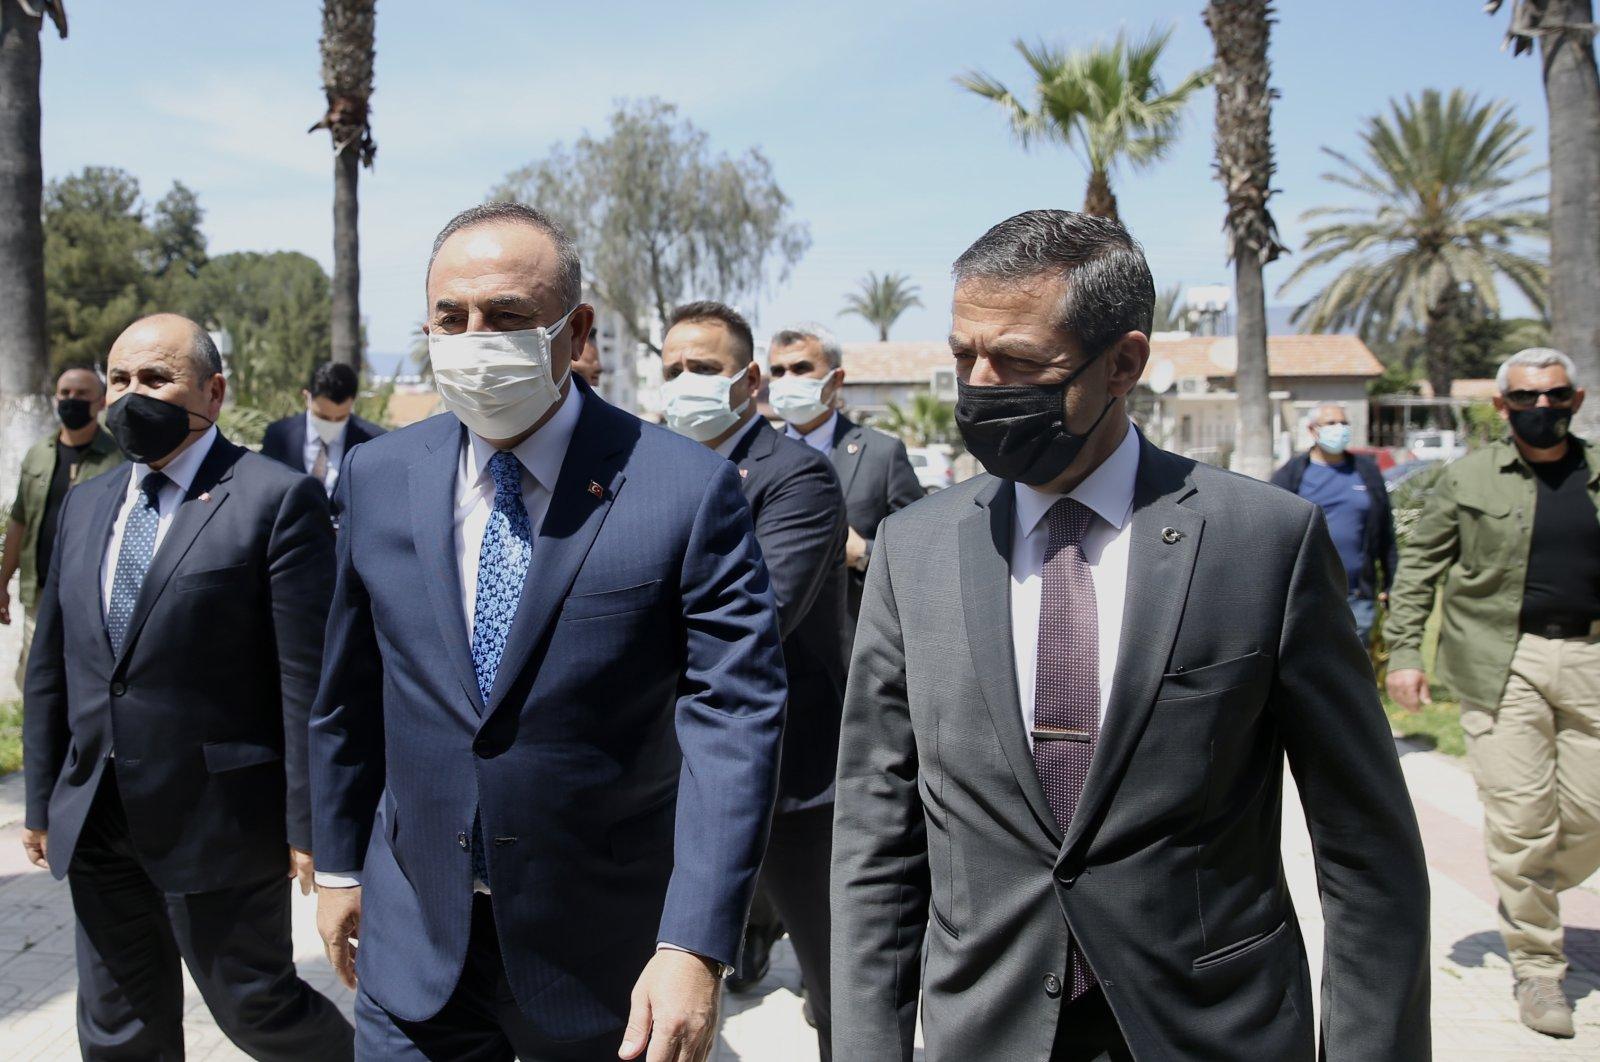 Foreign Minister Mevlüt Çavuşoğlu (L) and Turkish Republic of Northern Cyprus (TRNC) Foreign Minister Tahsin Ertuğruloğlu in TRNC, April 16, 2021 (AA Photo)